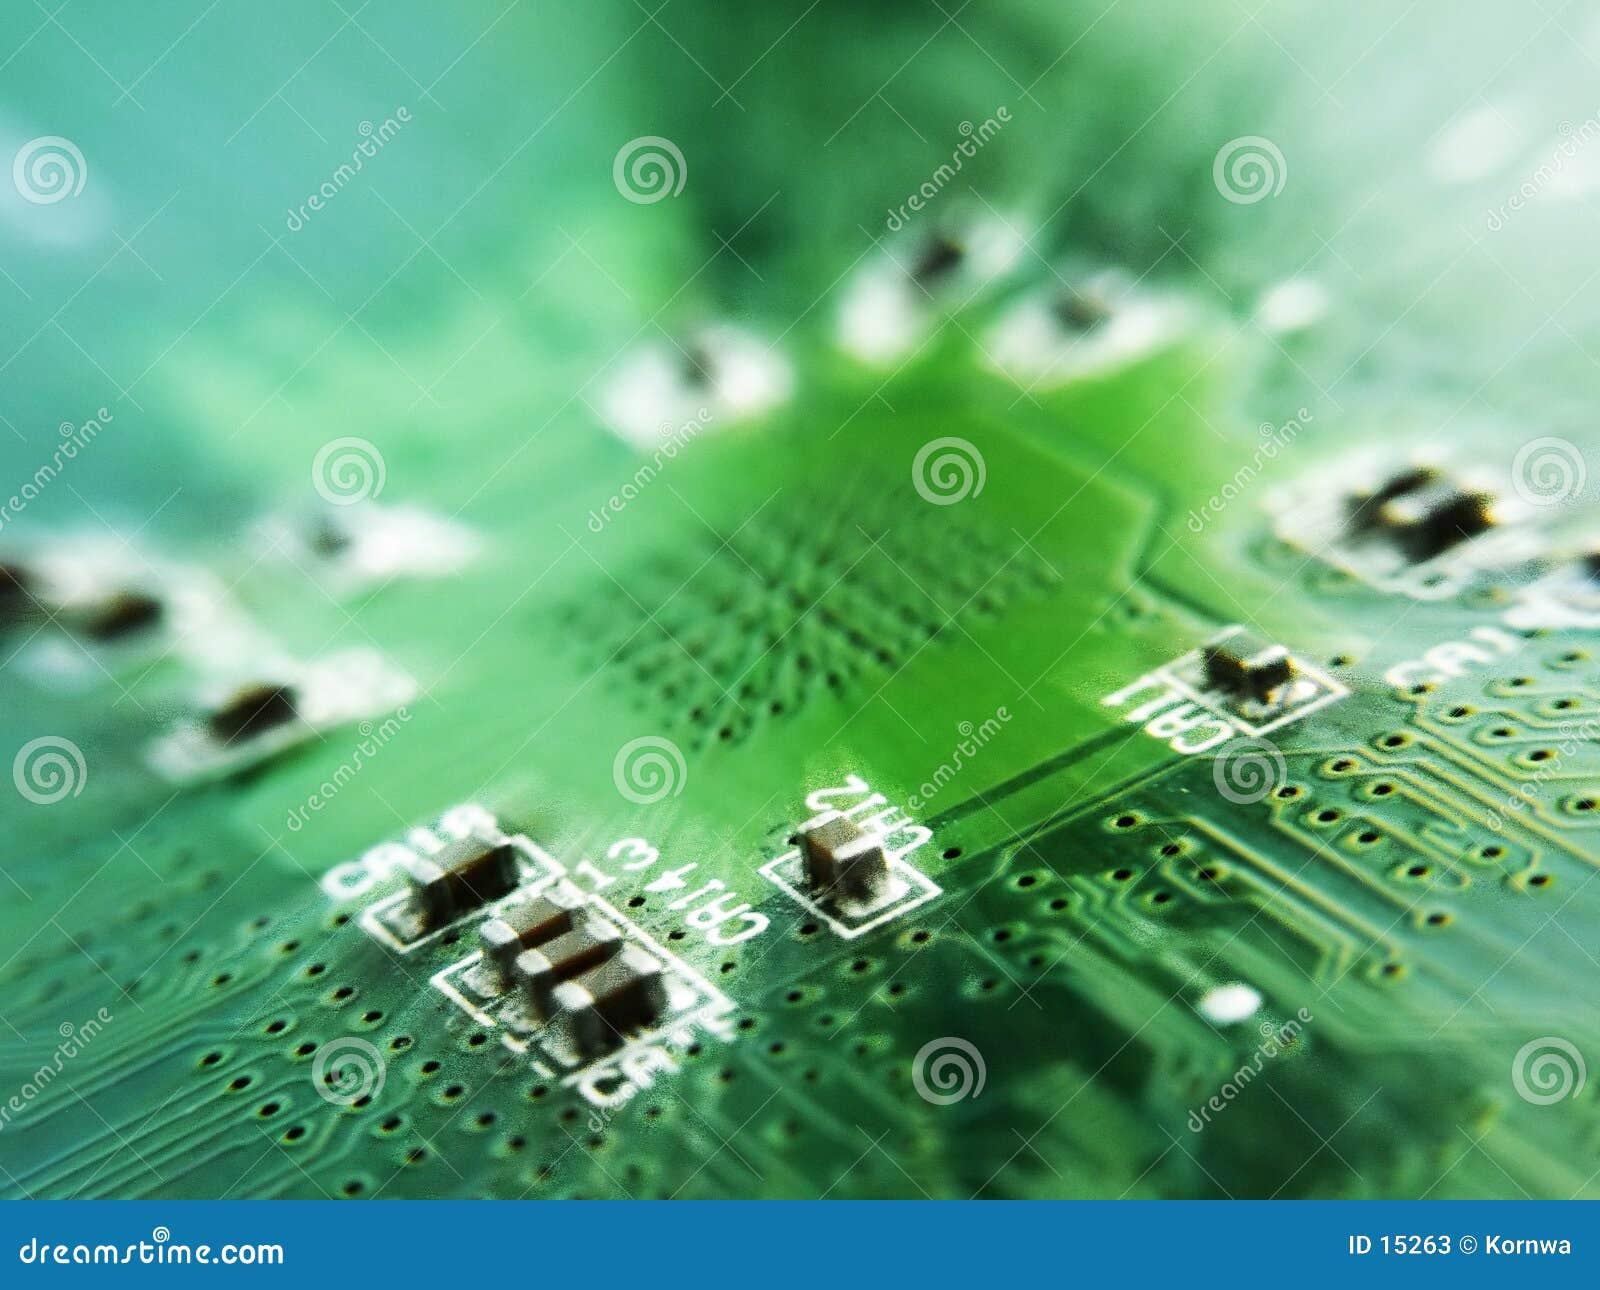 Cool sharpen electronics